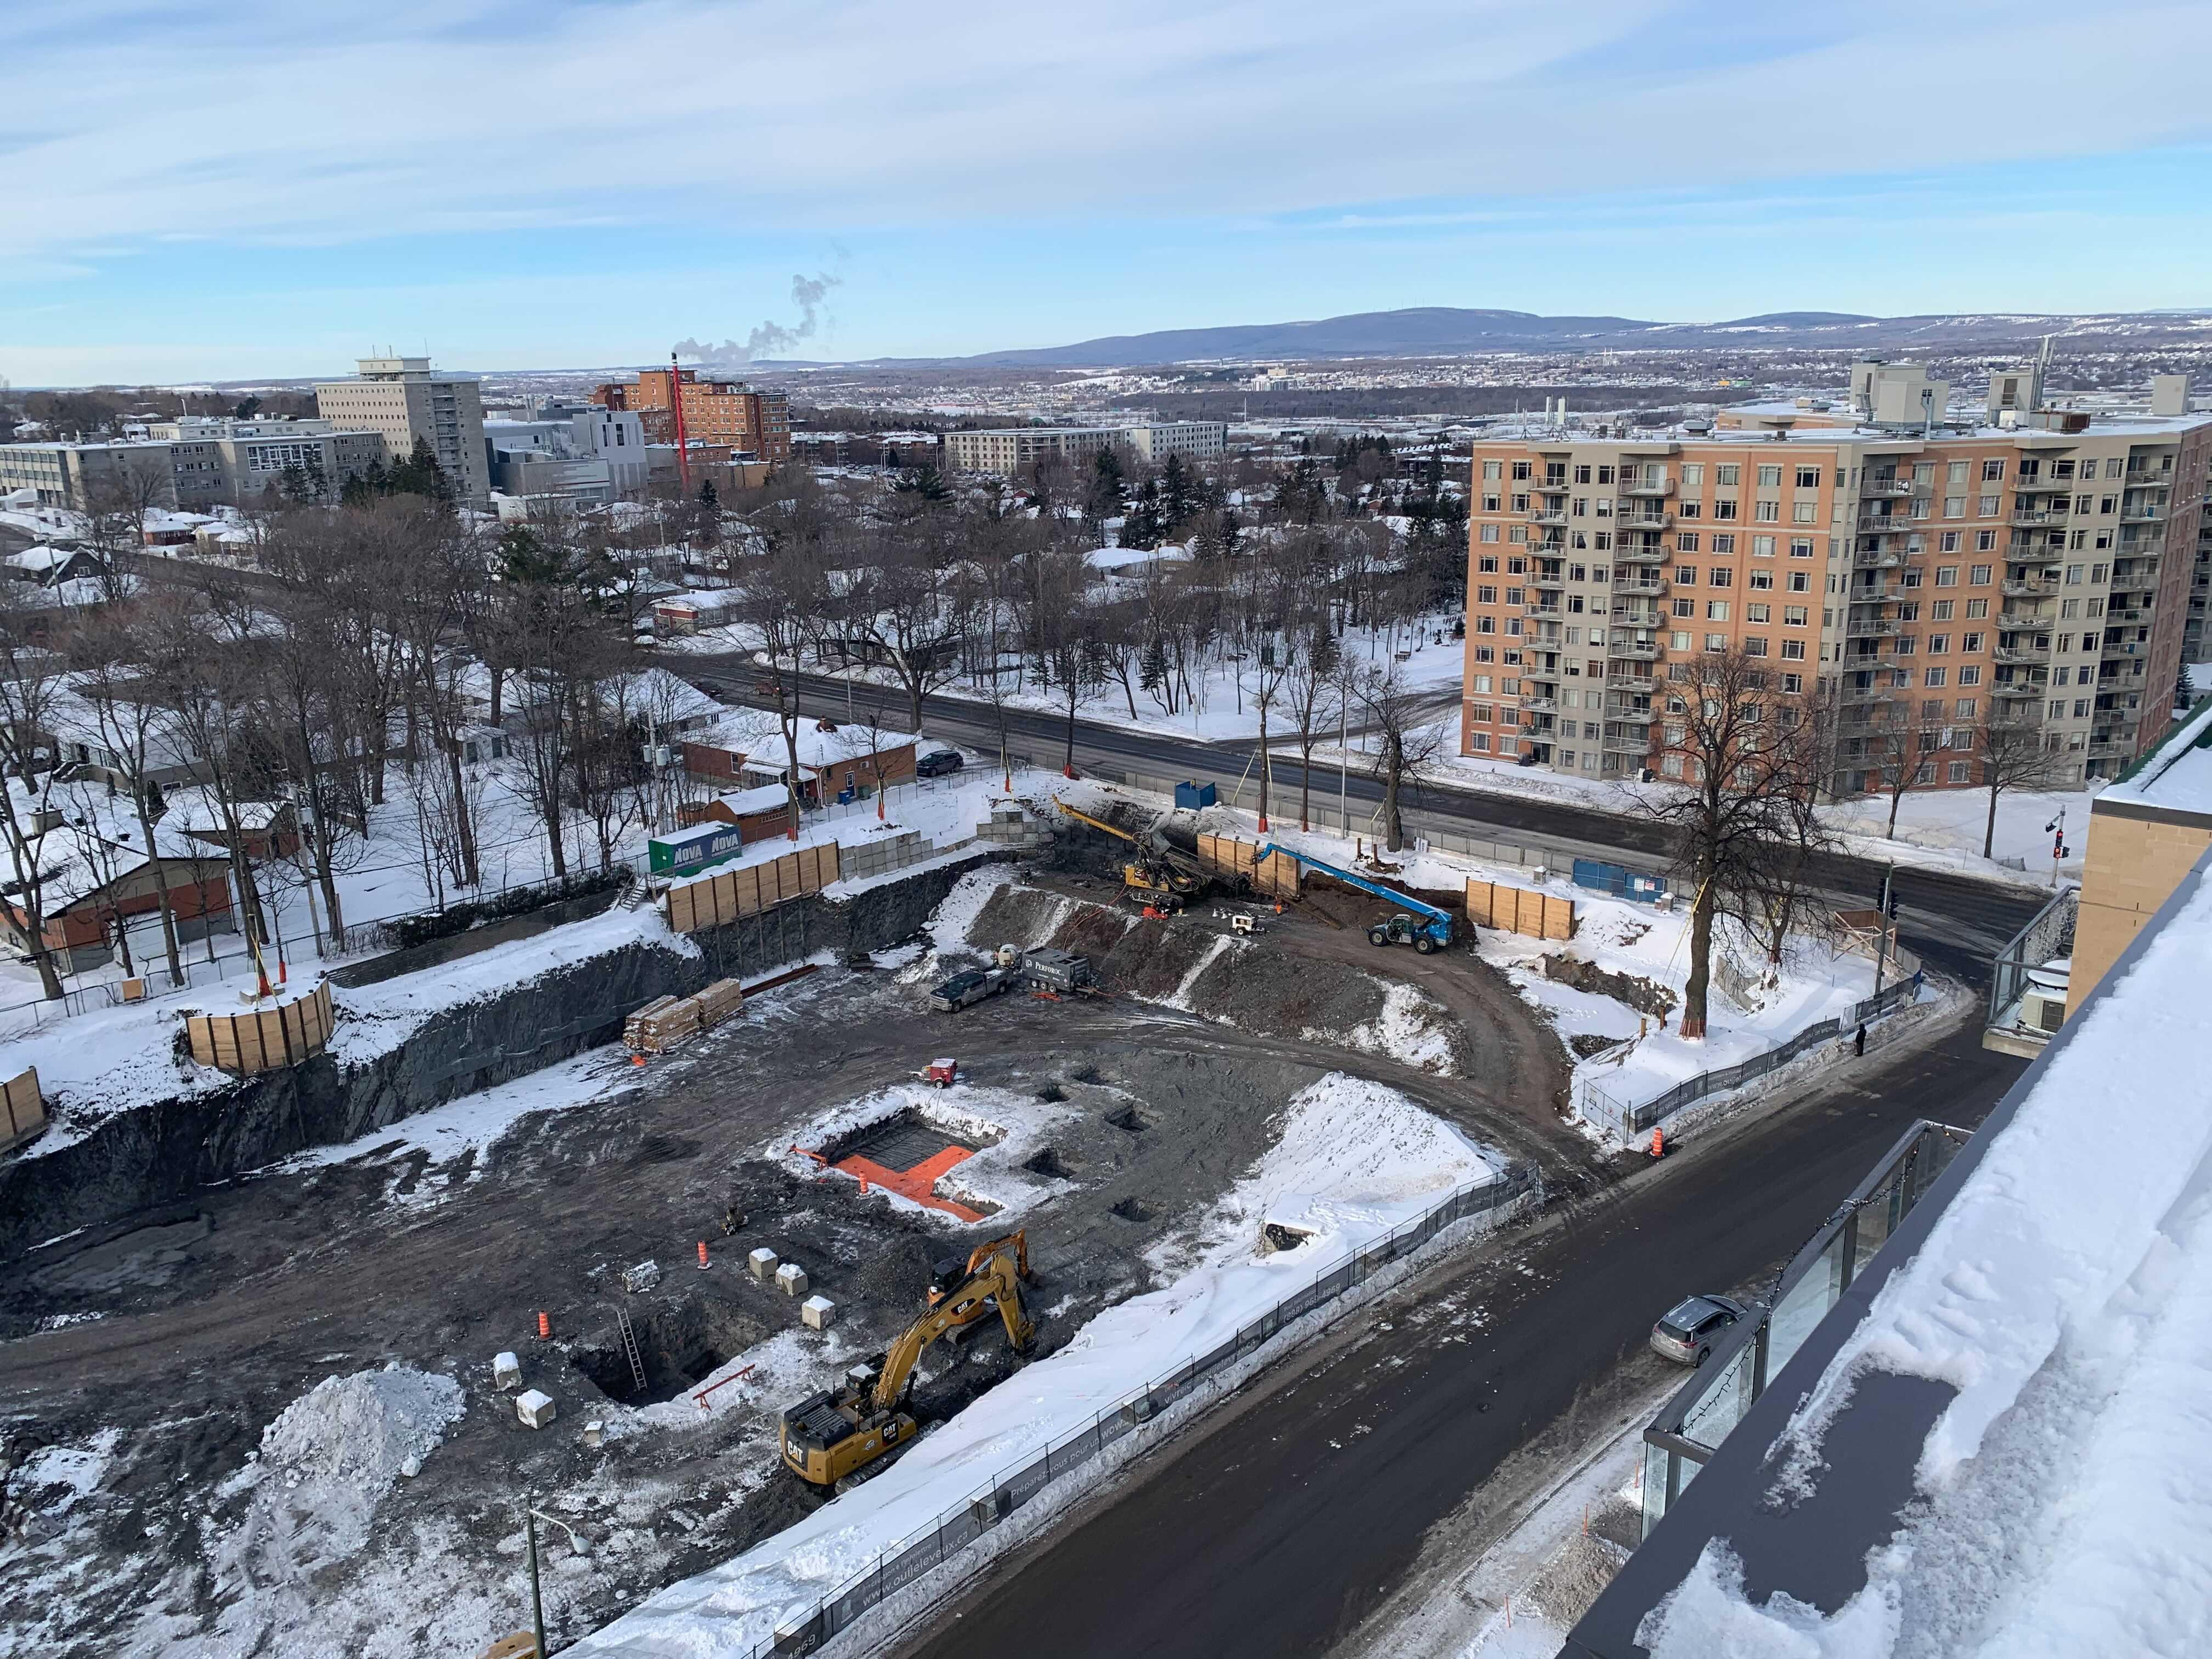 2021-01-19 - Progression du chantier